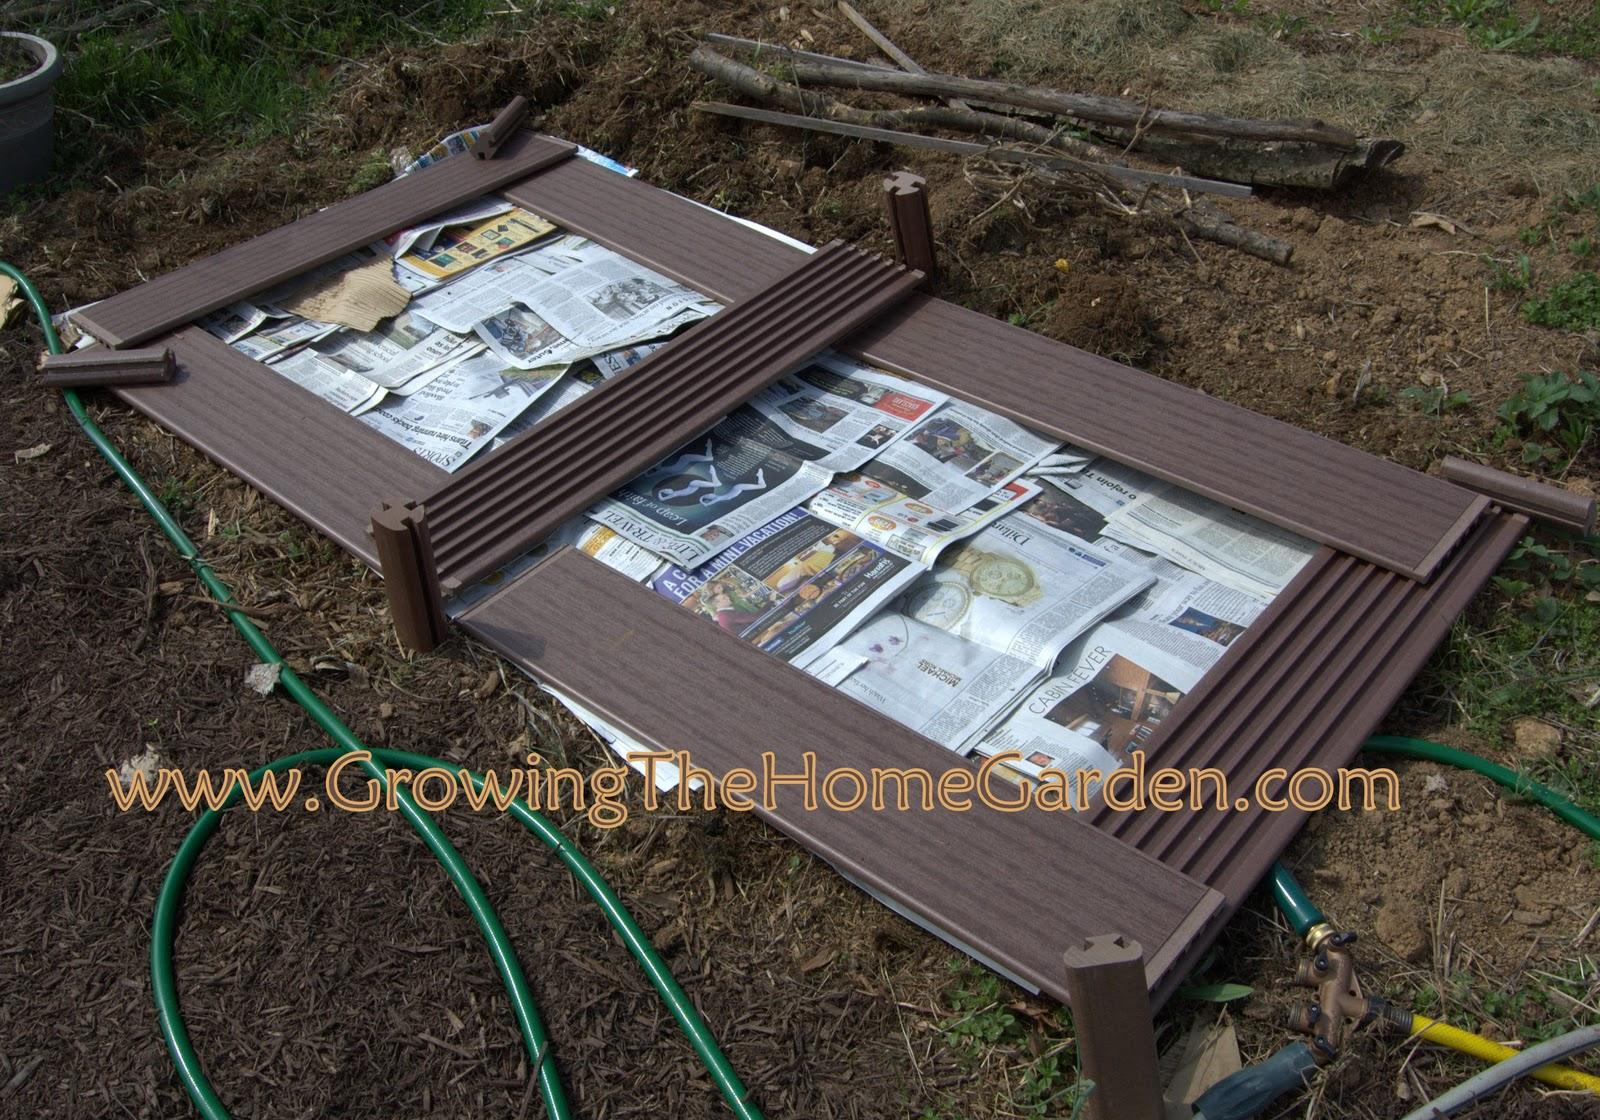 Greenland gardener raised bed garden kit - Greenland Gardener Raised Beds